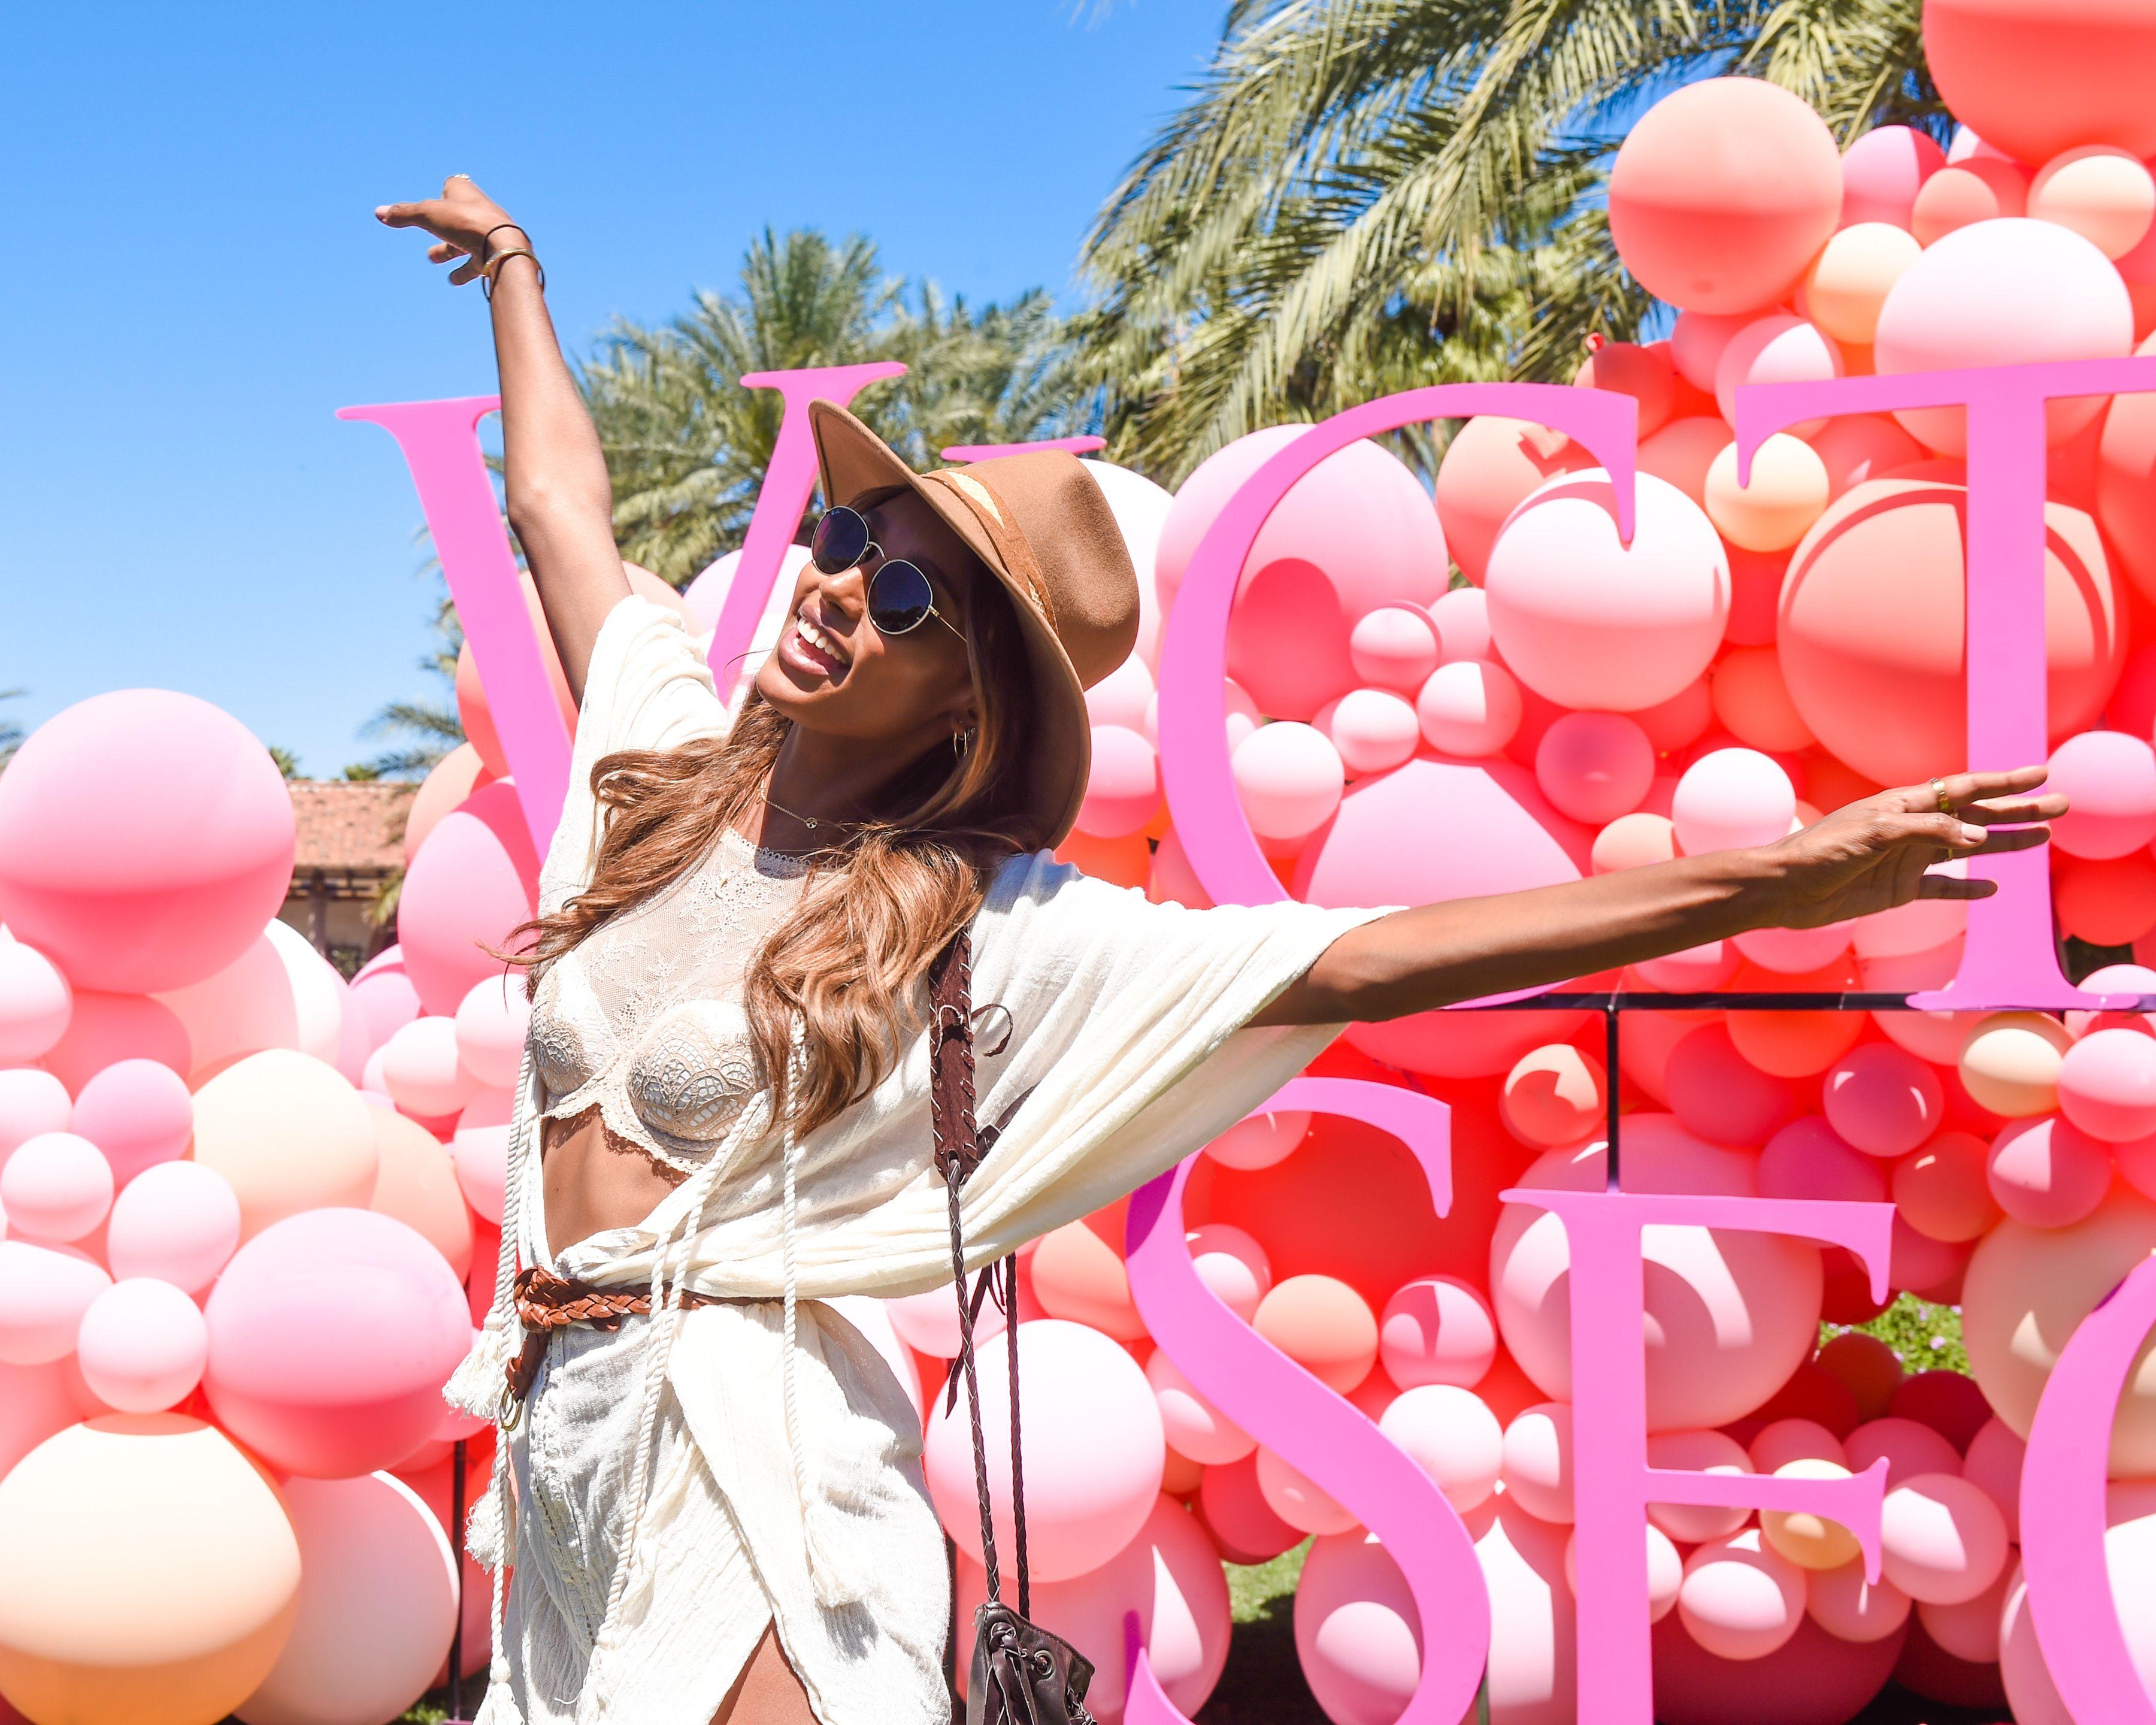 Jasmine TookesVictoria Secrets 'Angel Oasis', Coachella Valley Music and Arts Festival, Palm Springs, USA - 14 Apr 2017